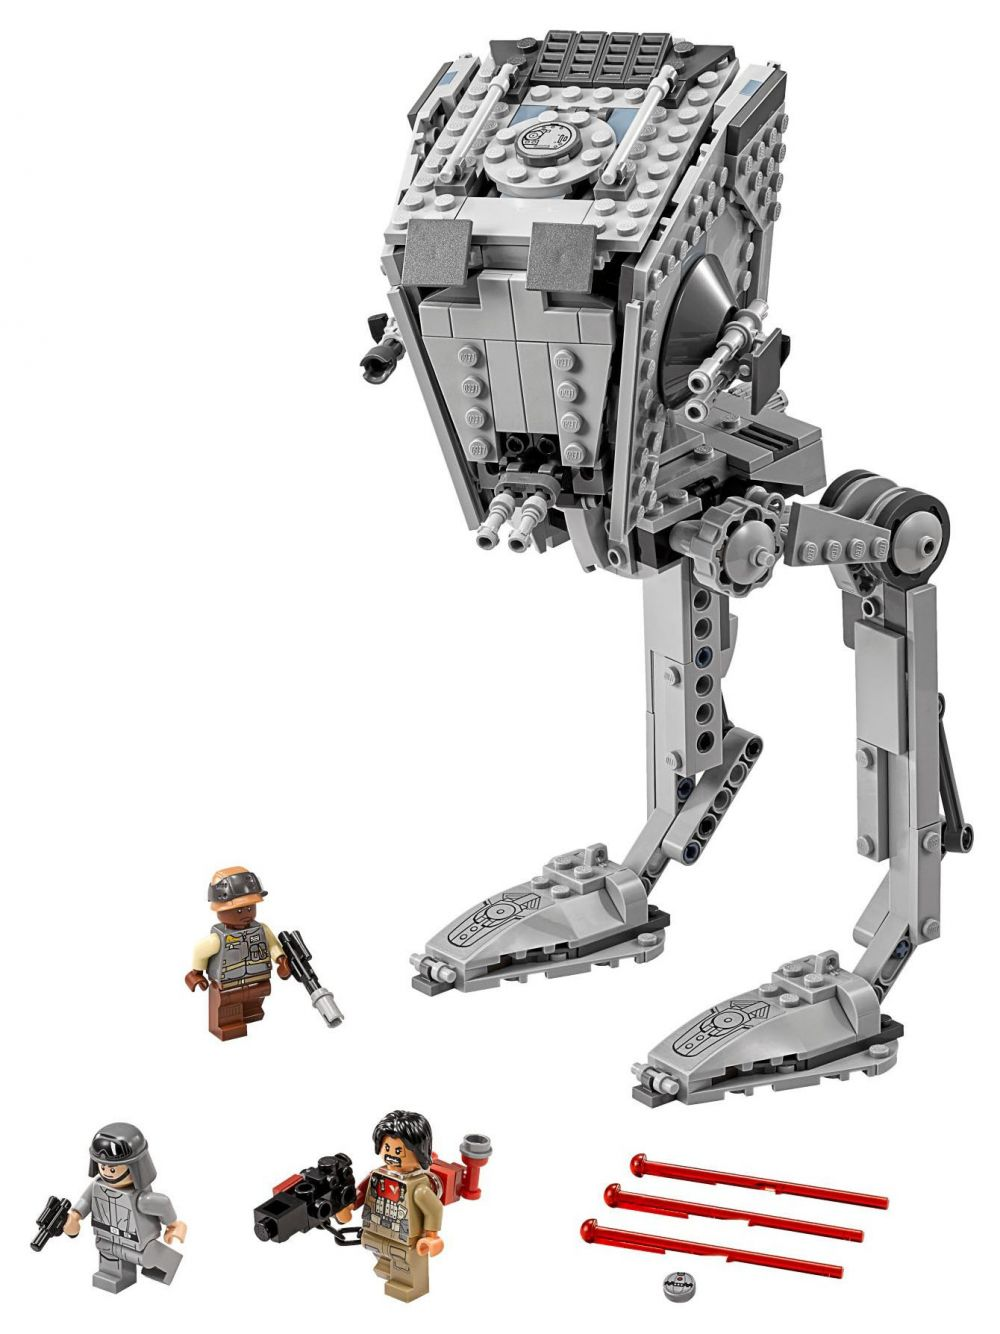 Lego star wars 75153 pas cher at st walker - Image star wars lego ...